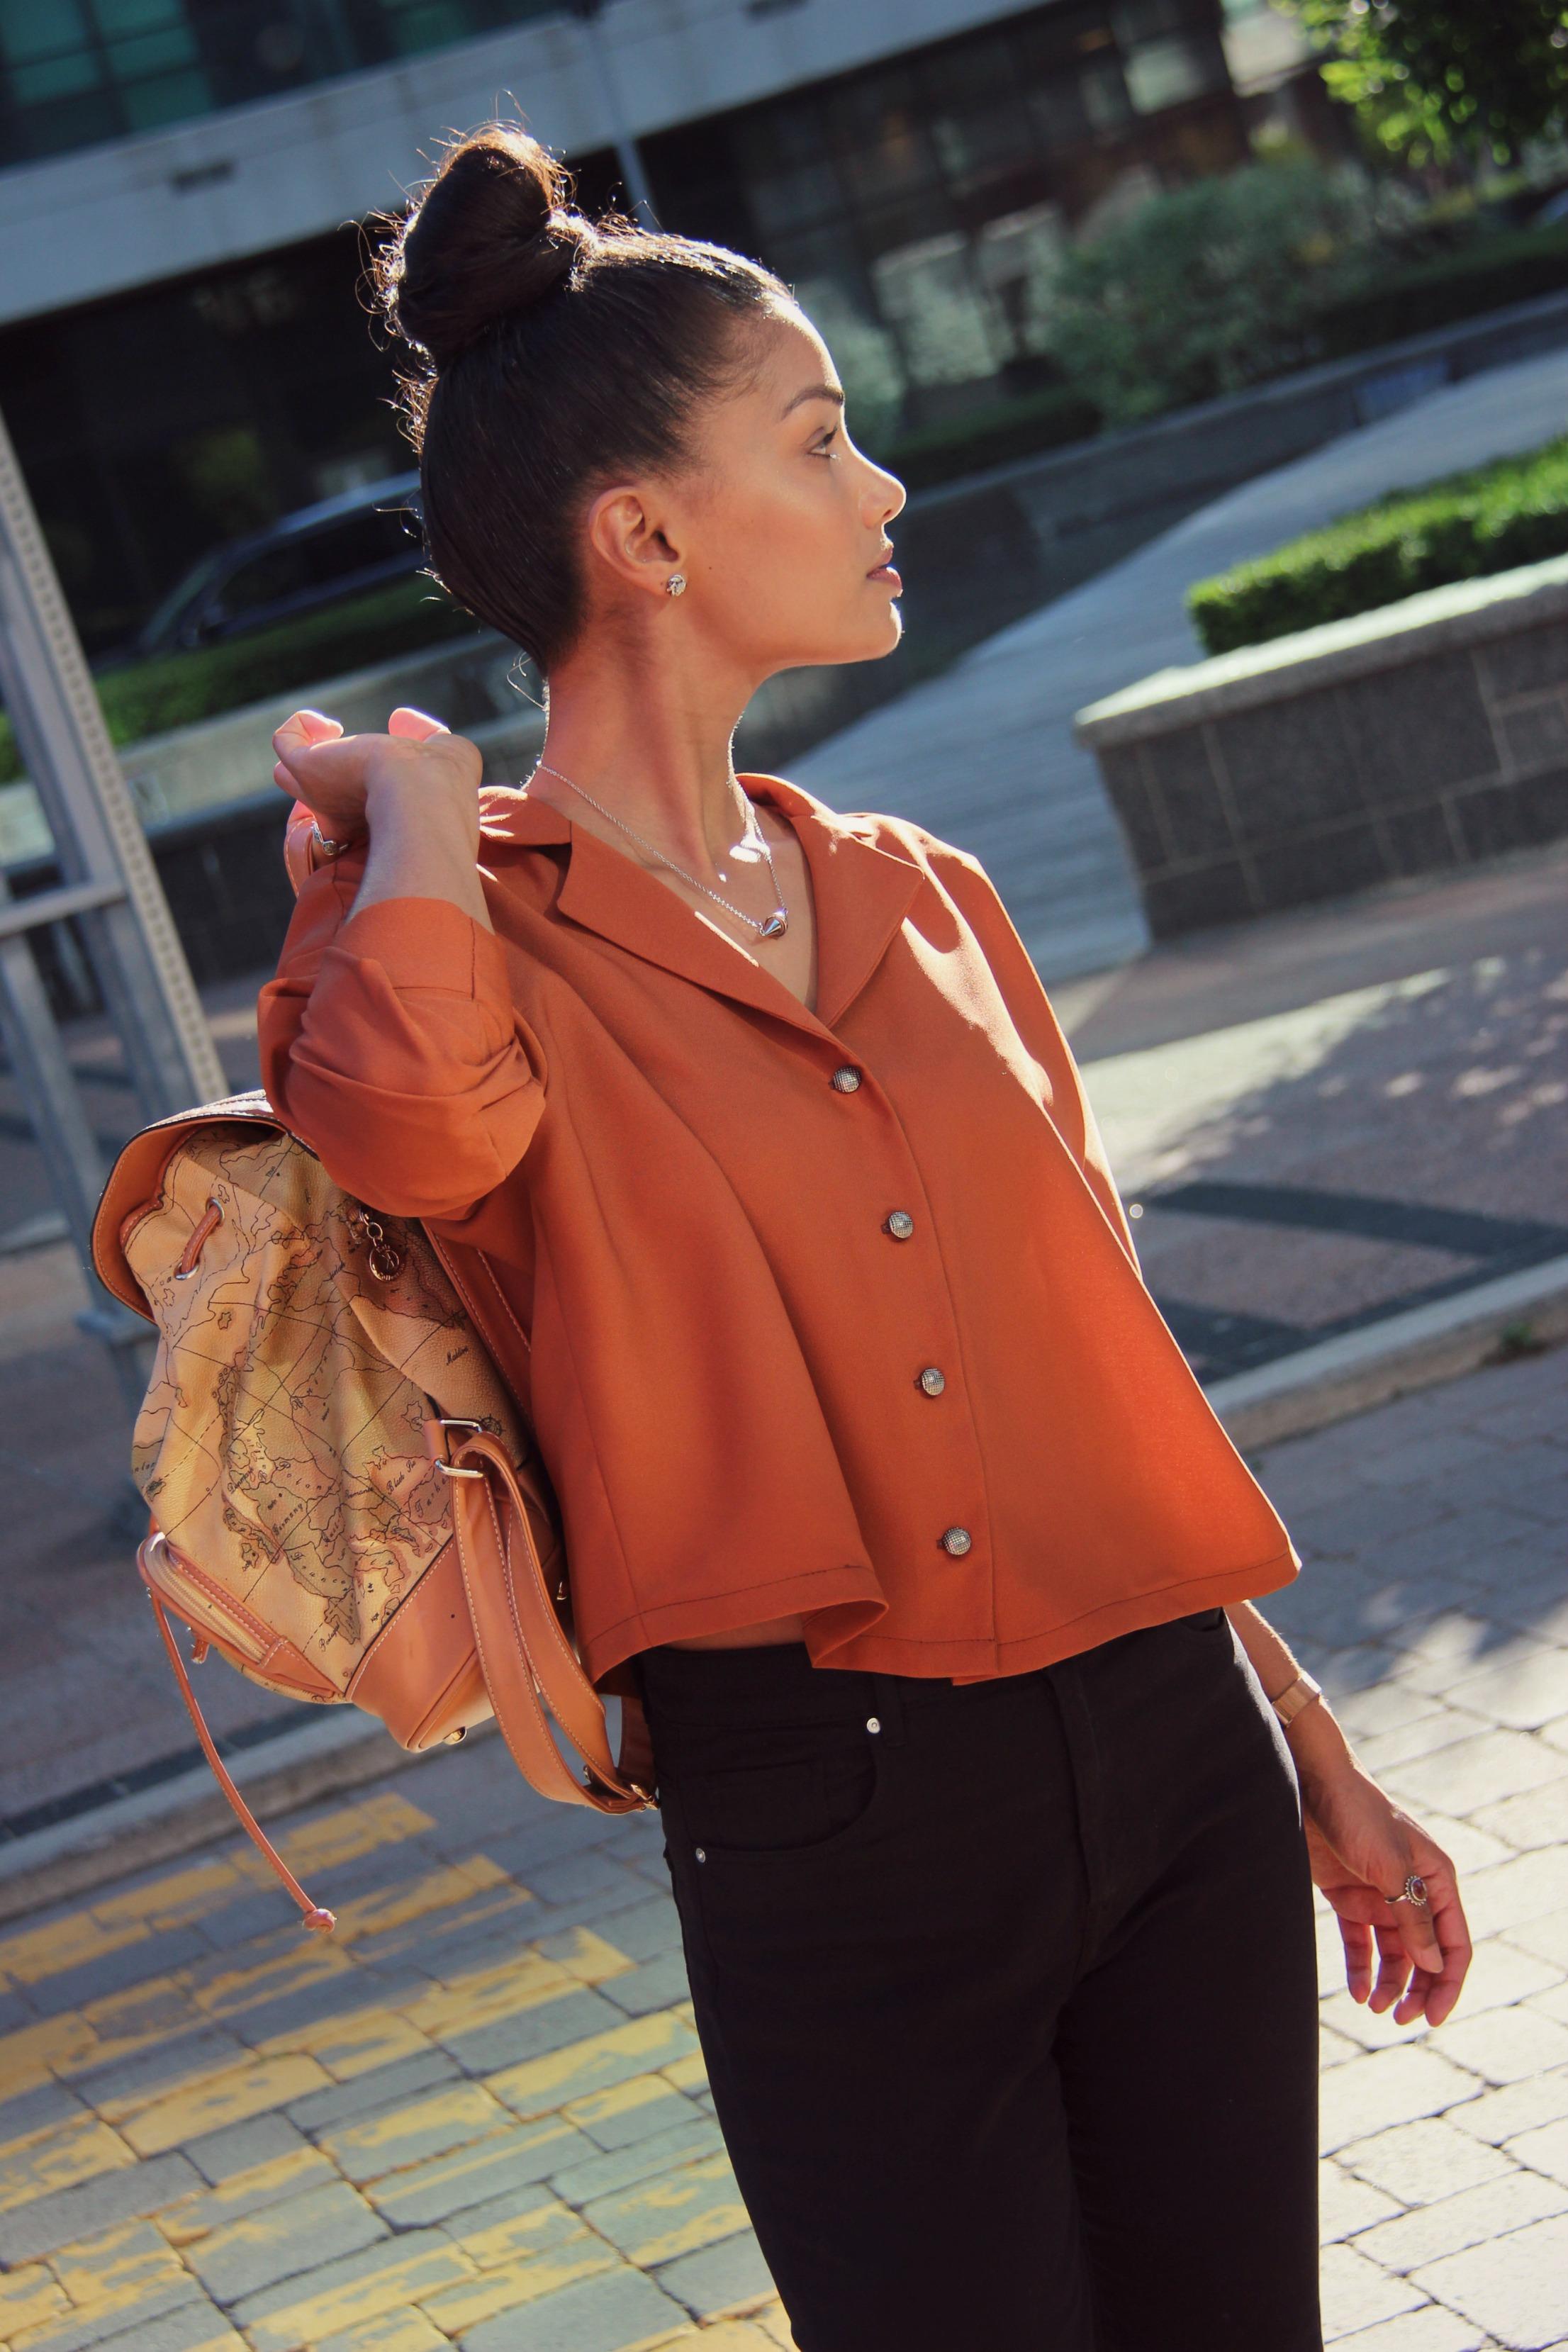 Burda Style V-Neck Button Up 03/2016 by Sweet Shard